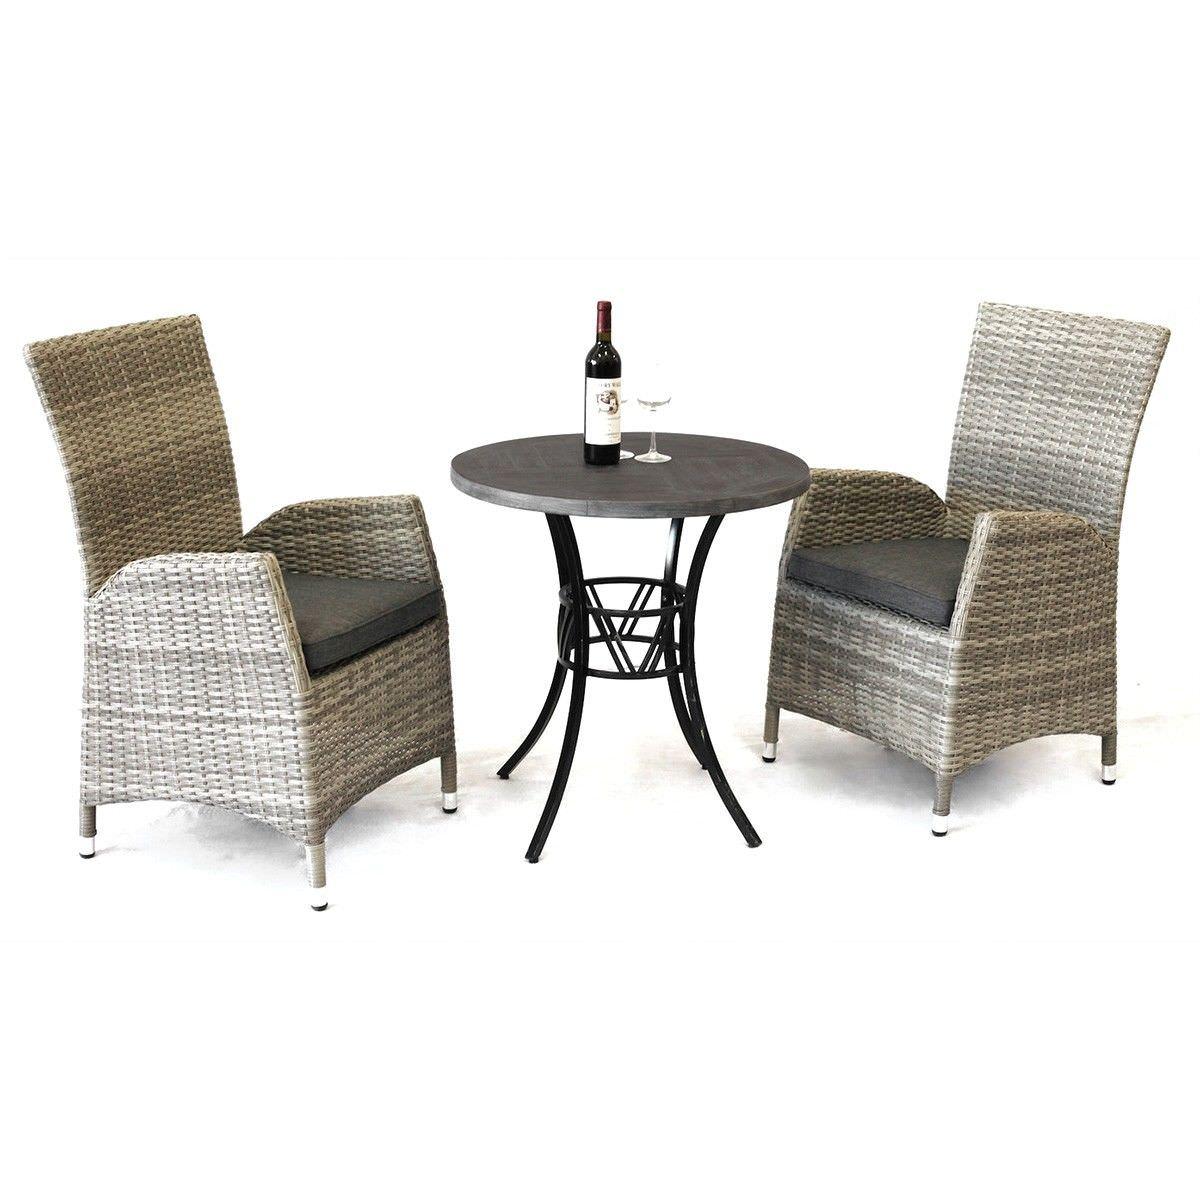 Sorrento 3 Piece Outdoor Round Dining Table Set, 70cm, Grey